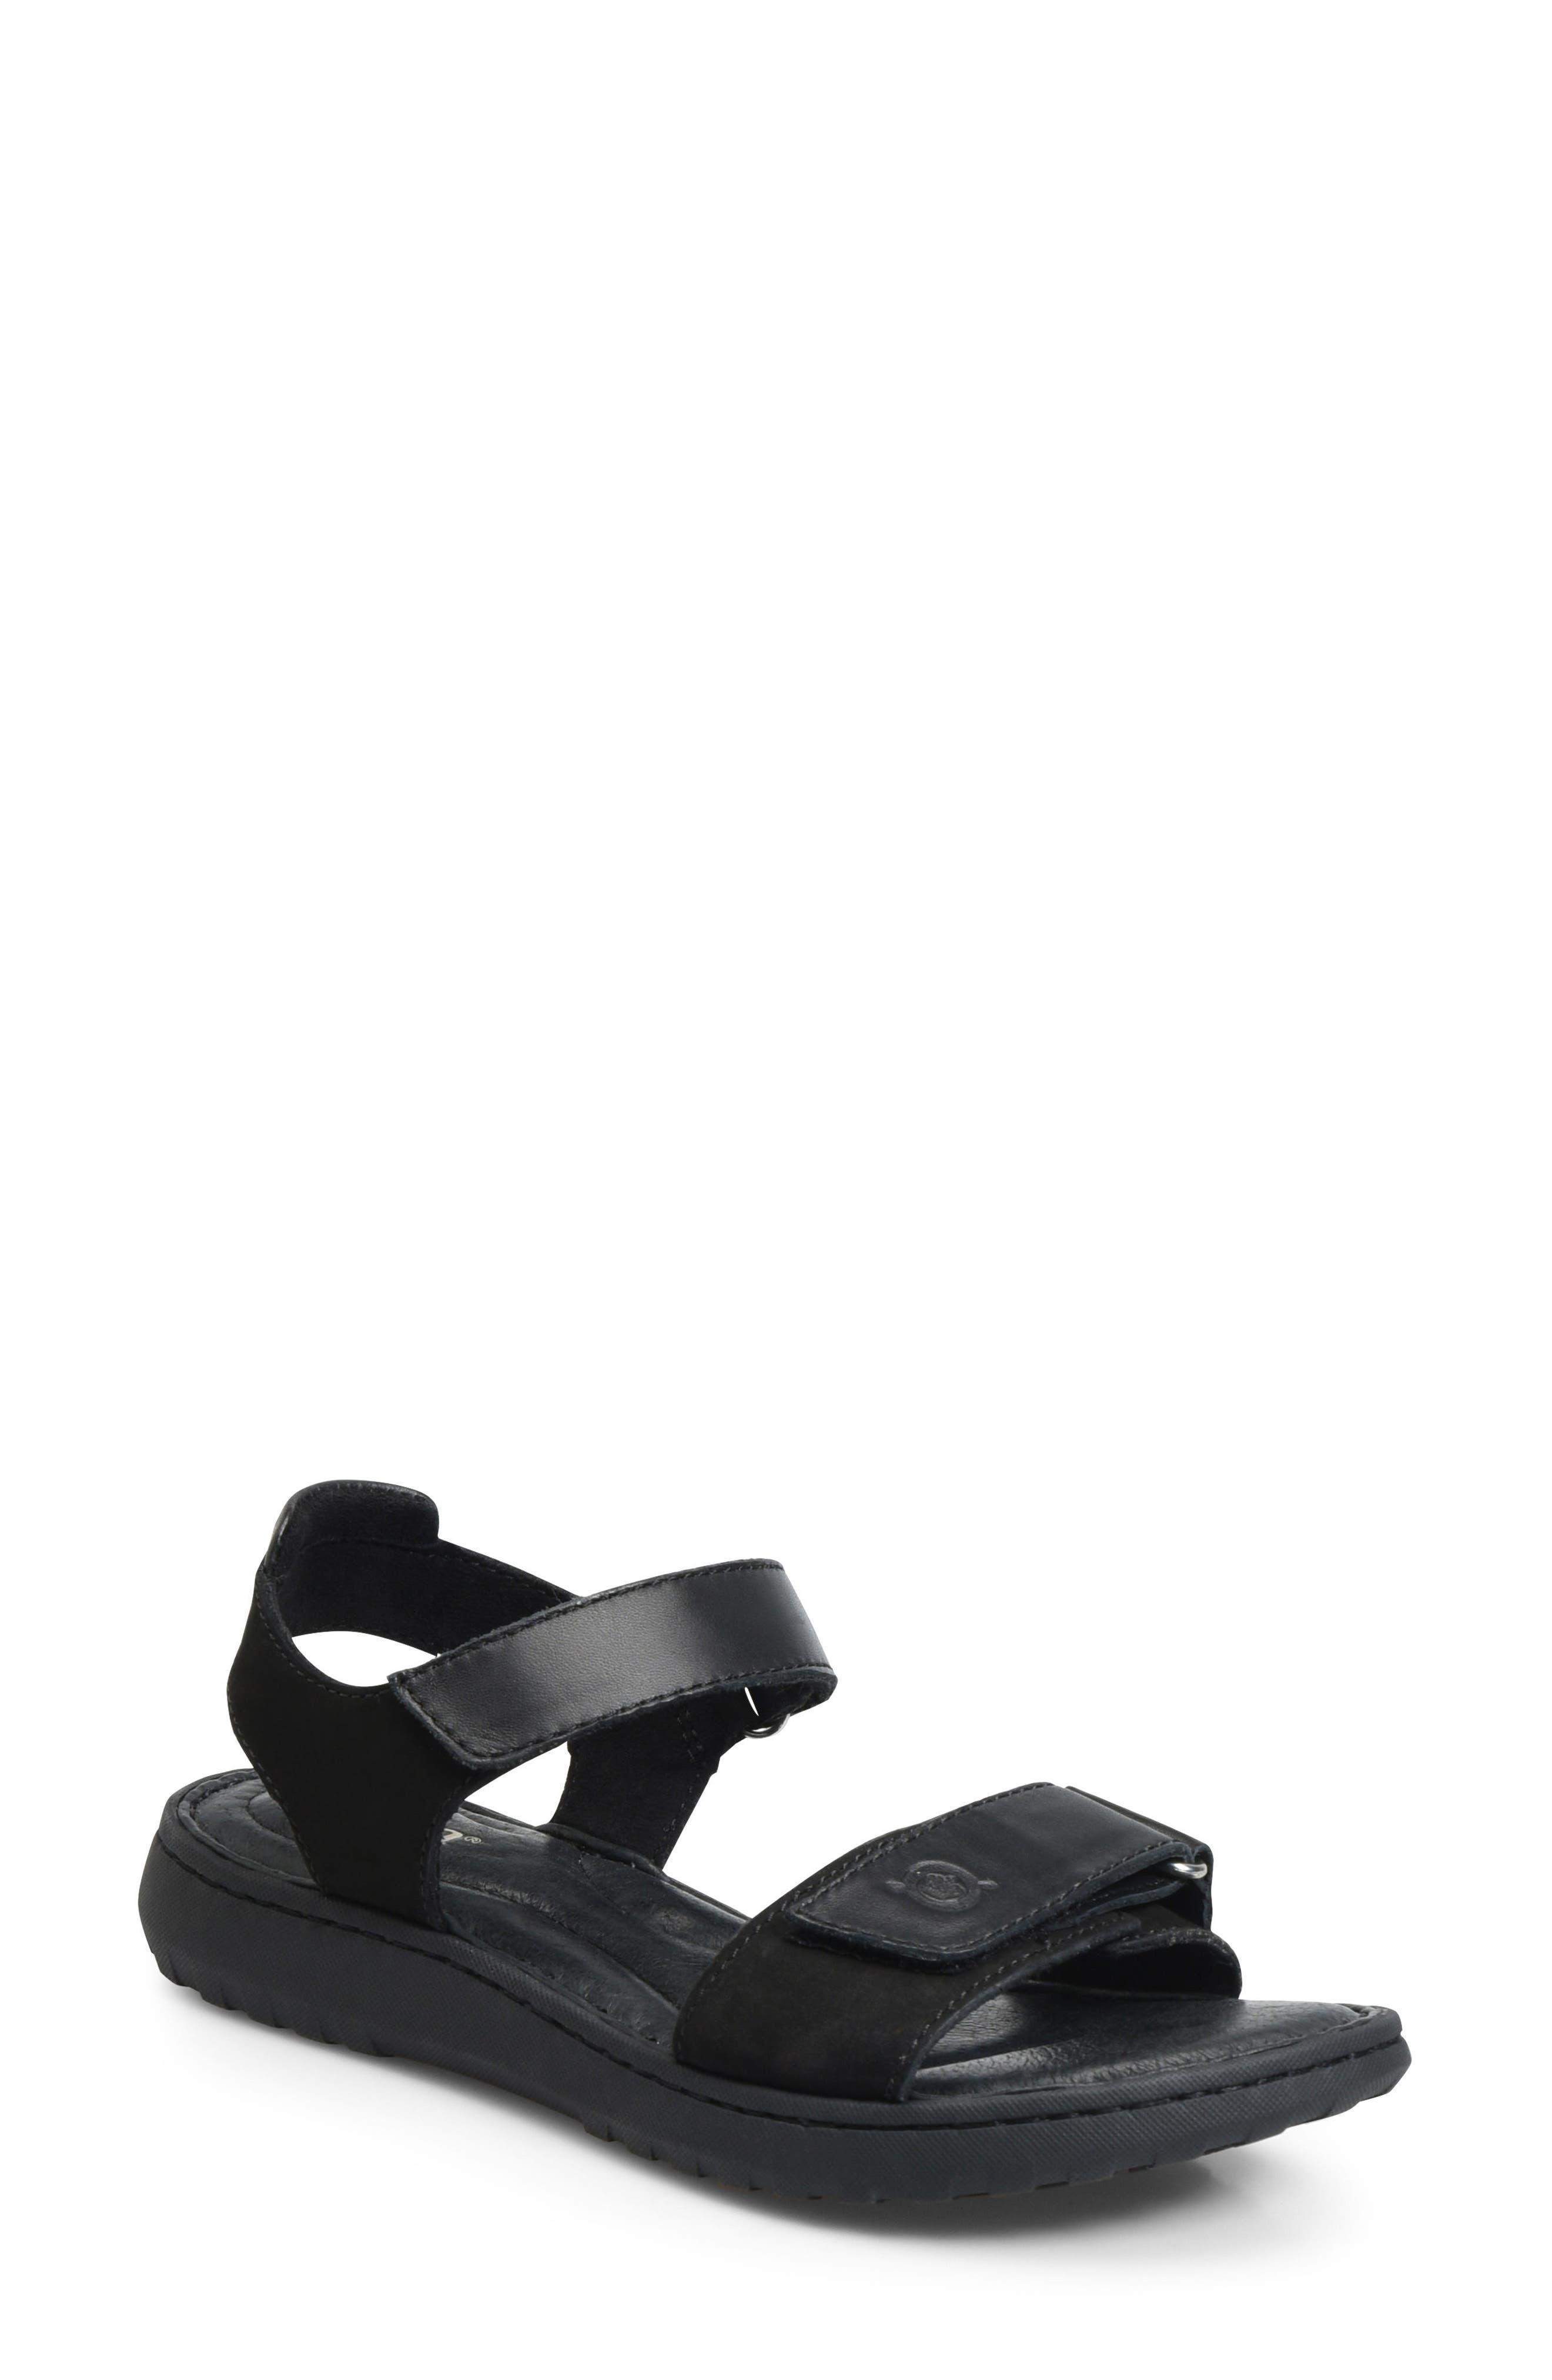 Nirvana Sandal,                         Main,                         color, 001